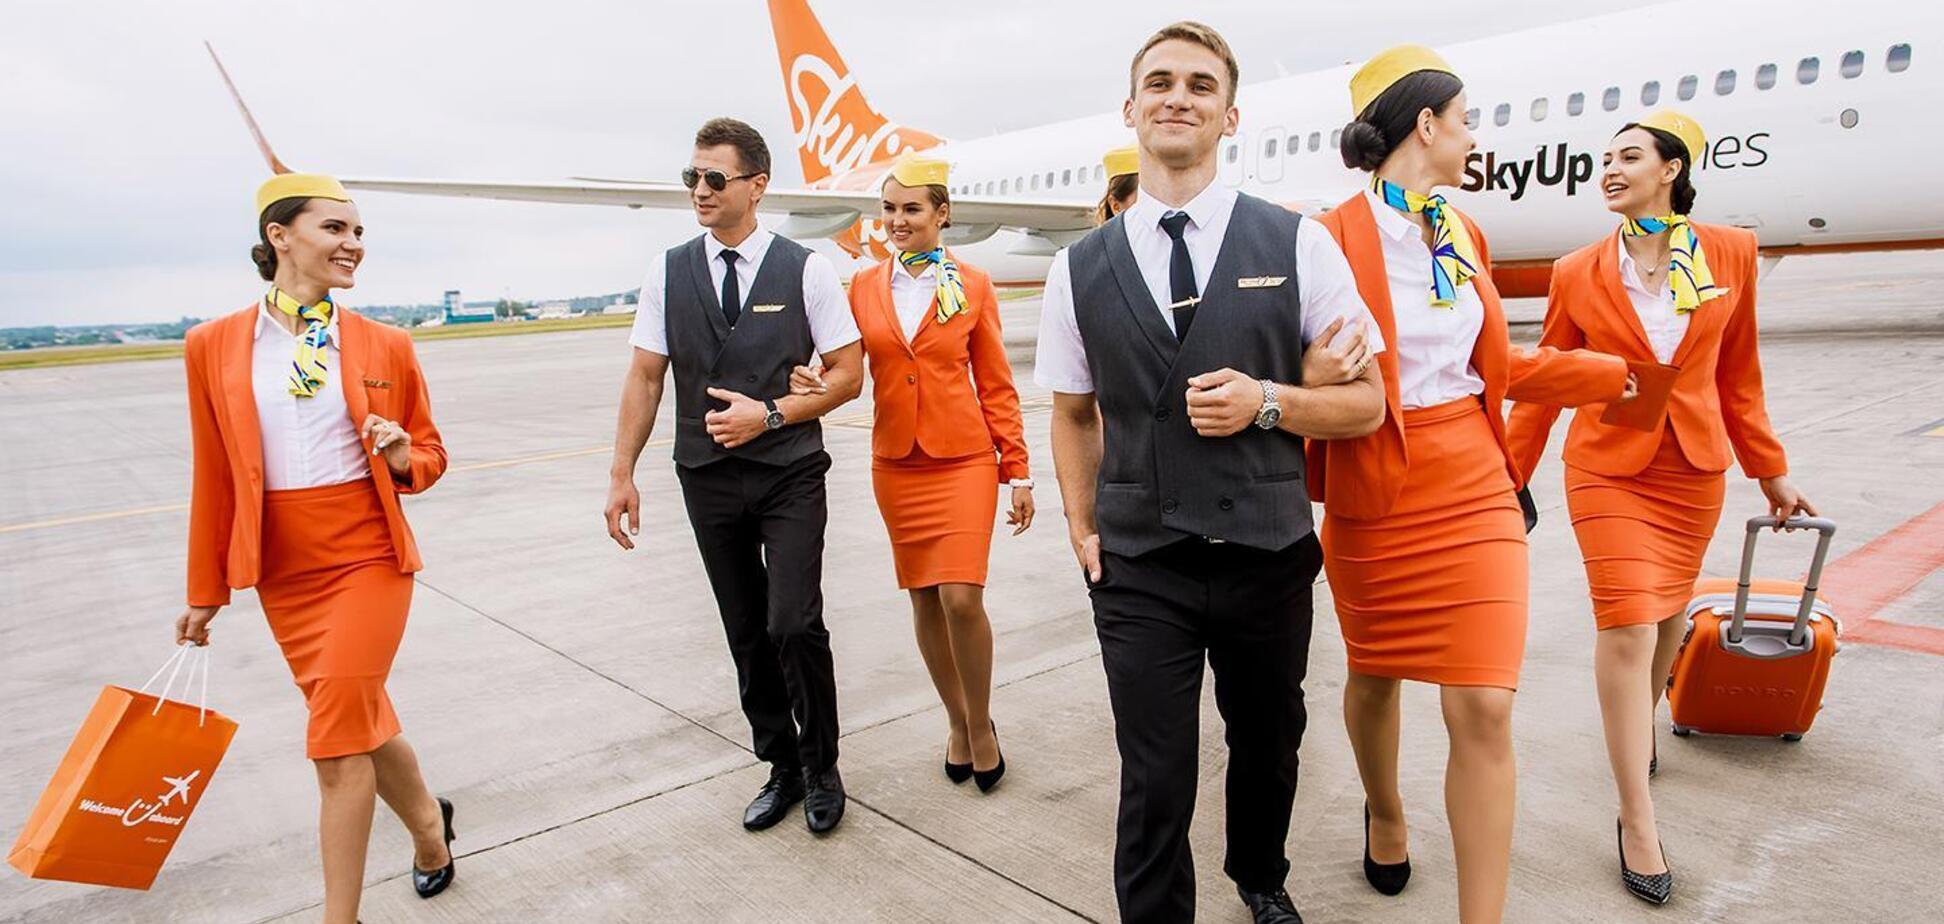 SkyUp скасувала міжнародні рейси (фото: uvidpustku.com)